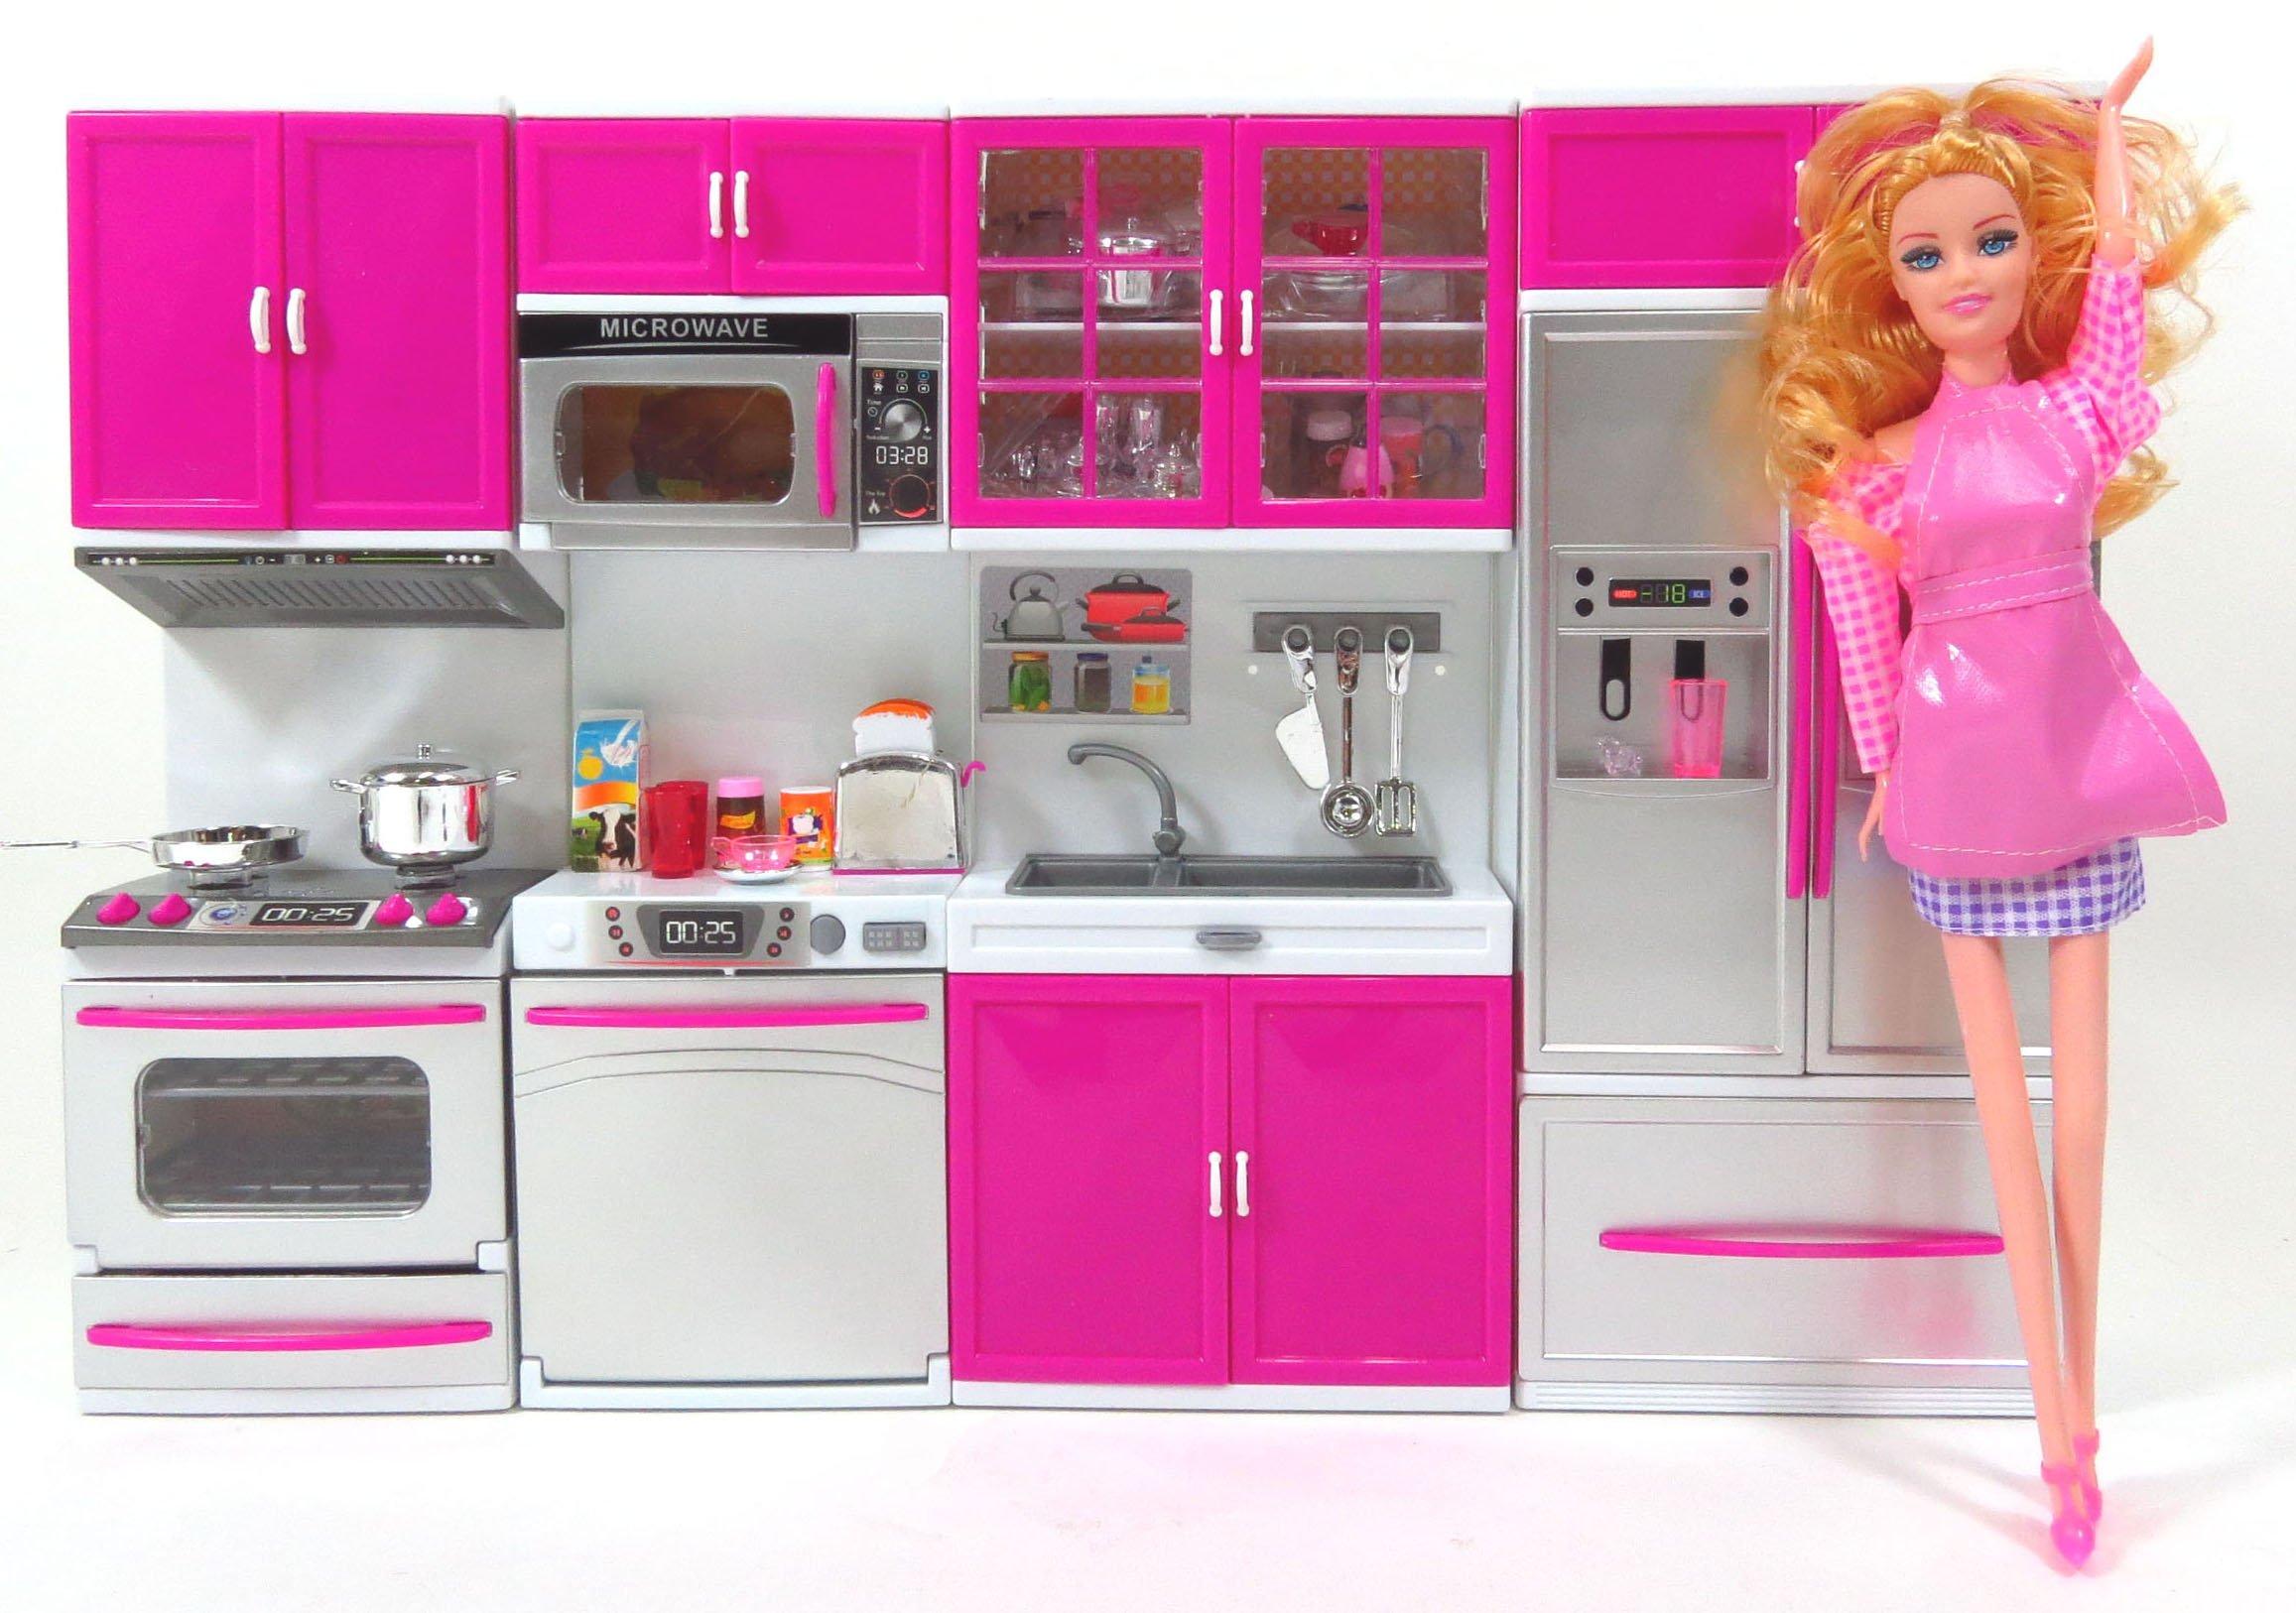 Kitchen Play Set Toy For Children,Barbie Doll Play Kitchen Toy ...